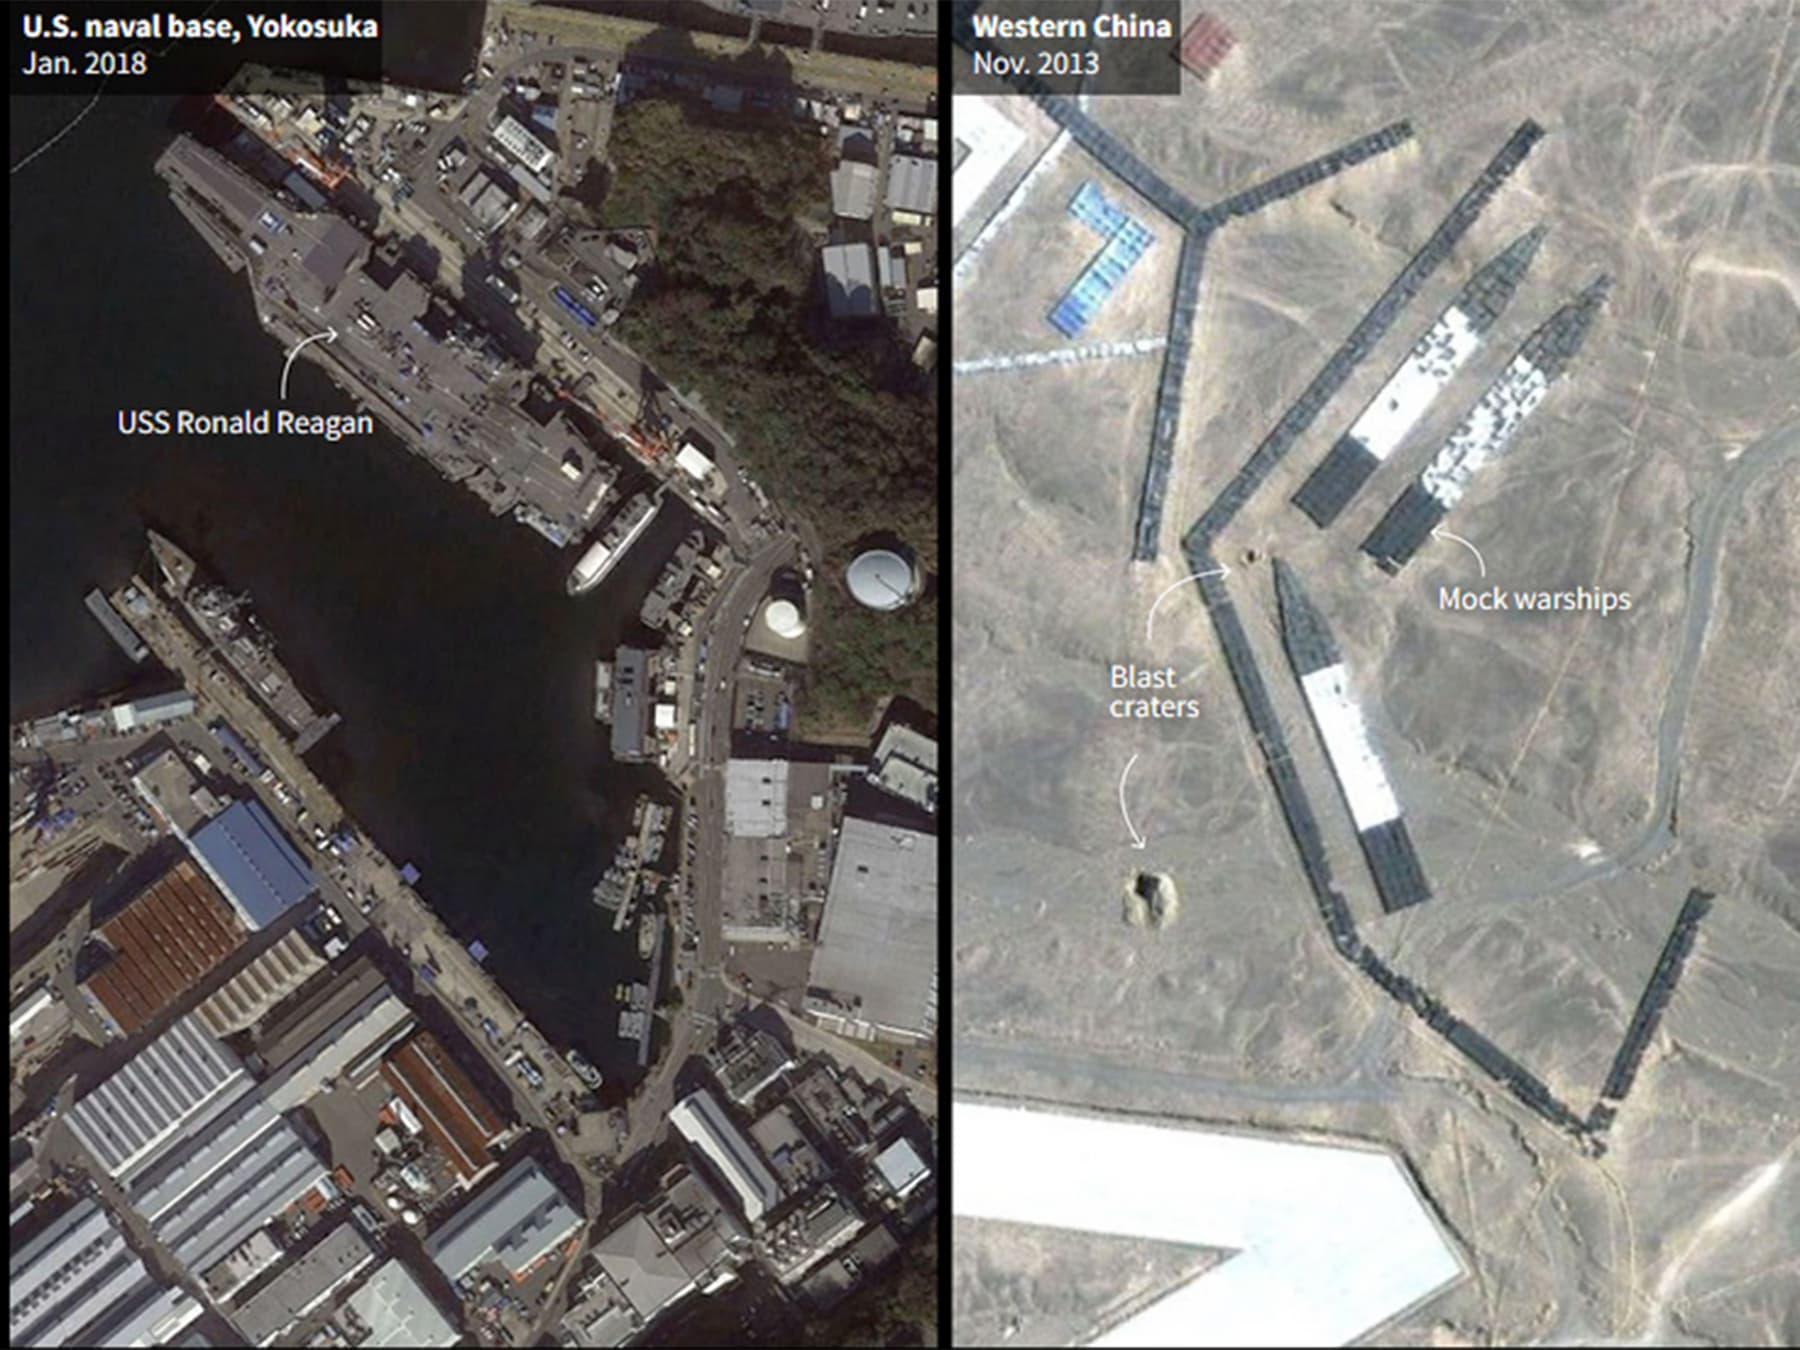 Satellite image: Google, DigitalGlobe, Landsat / Copernicus